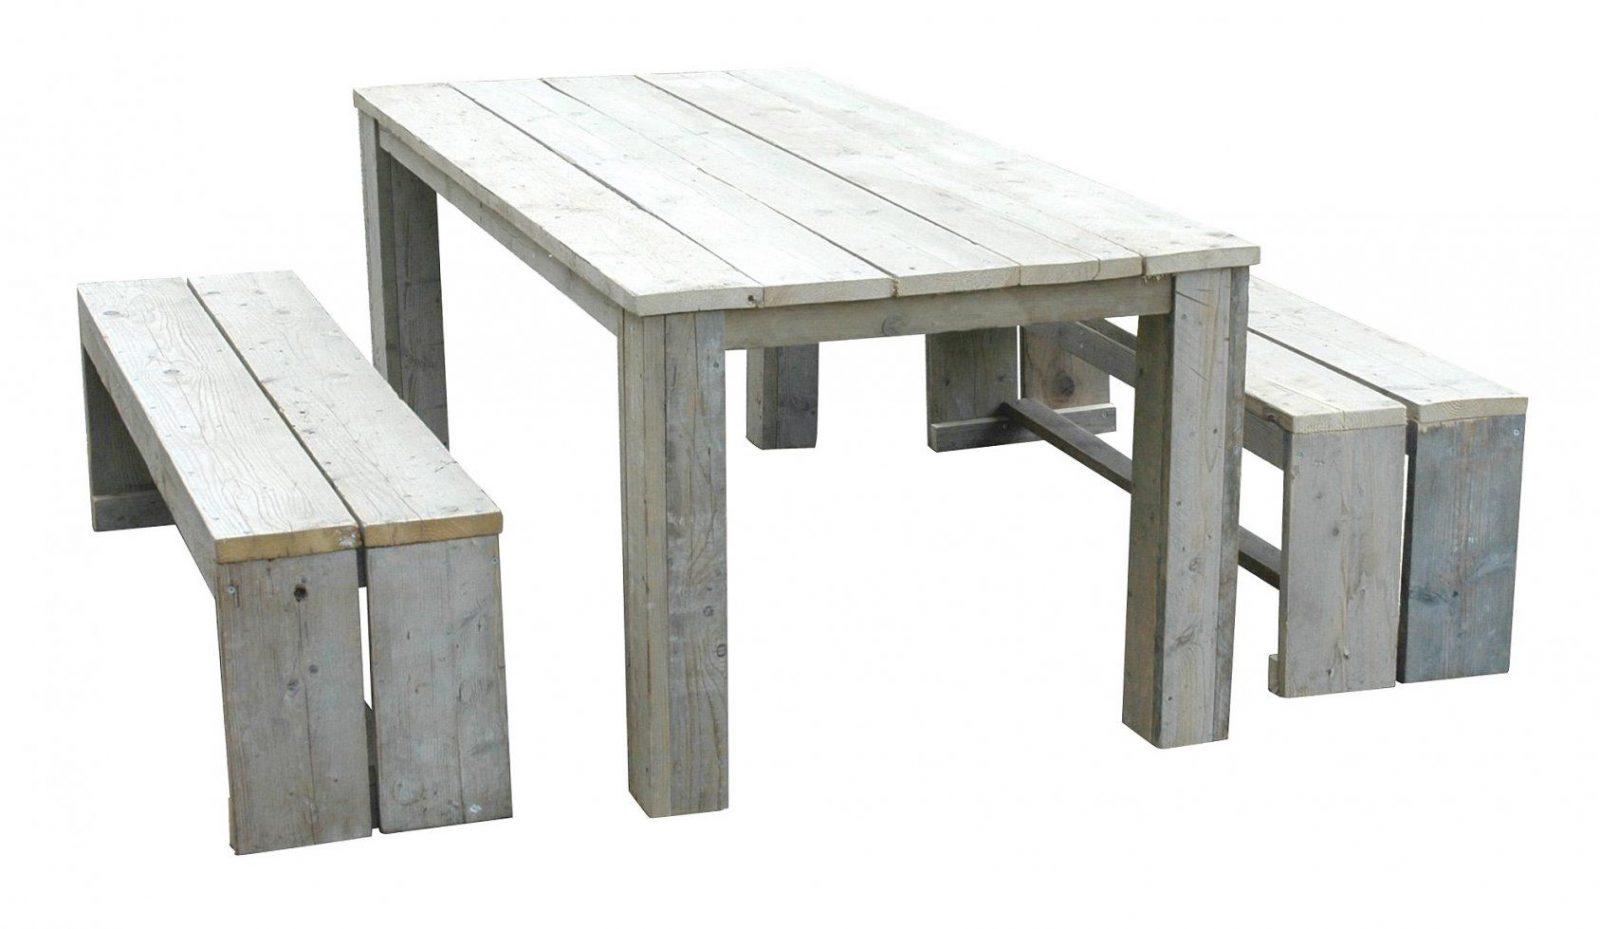 Möbel Aus Bauholz Selber Bauen Harzite Von Bauholz Möbel Selber